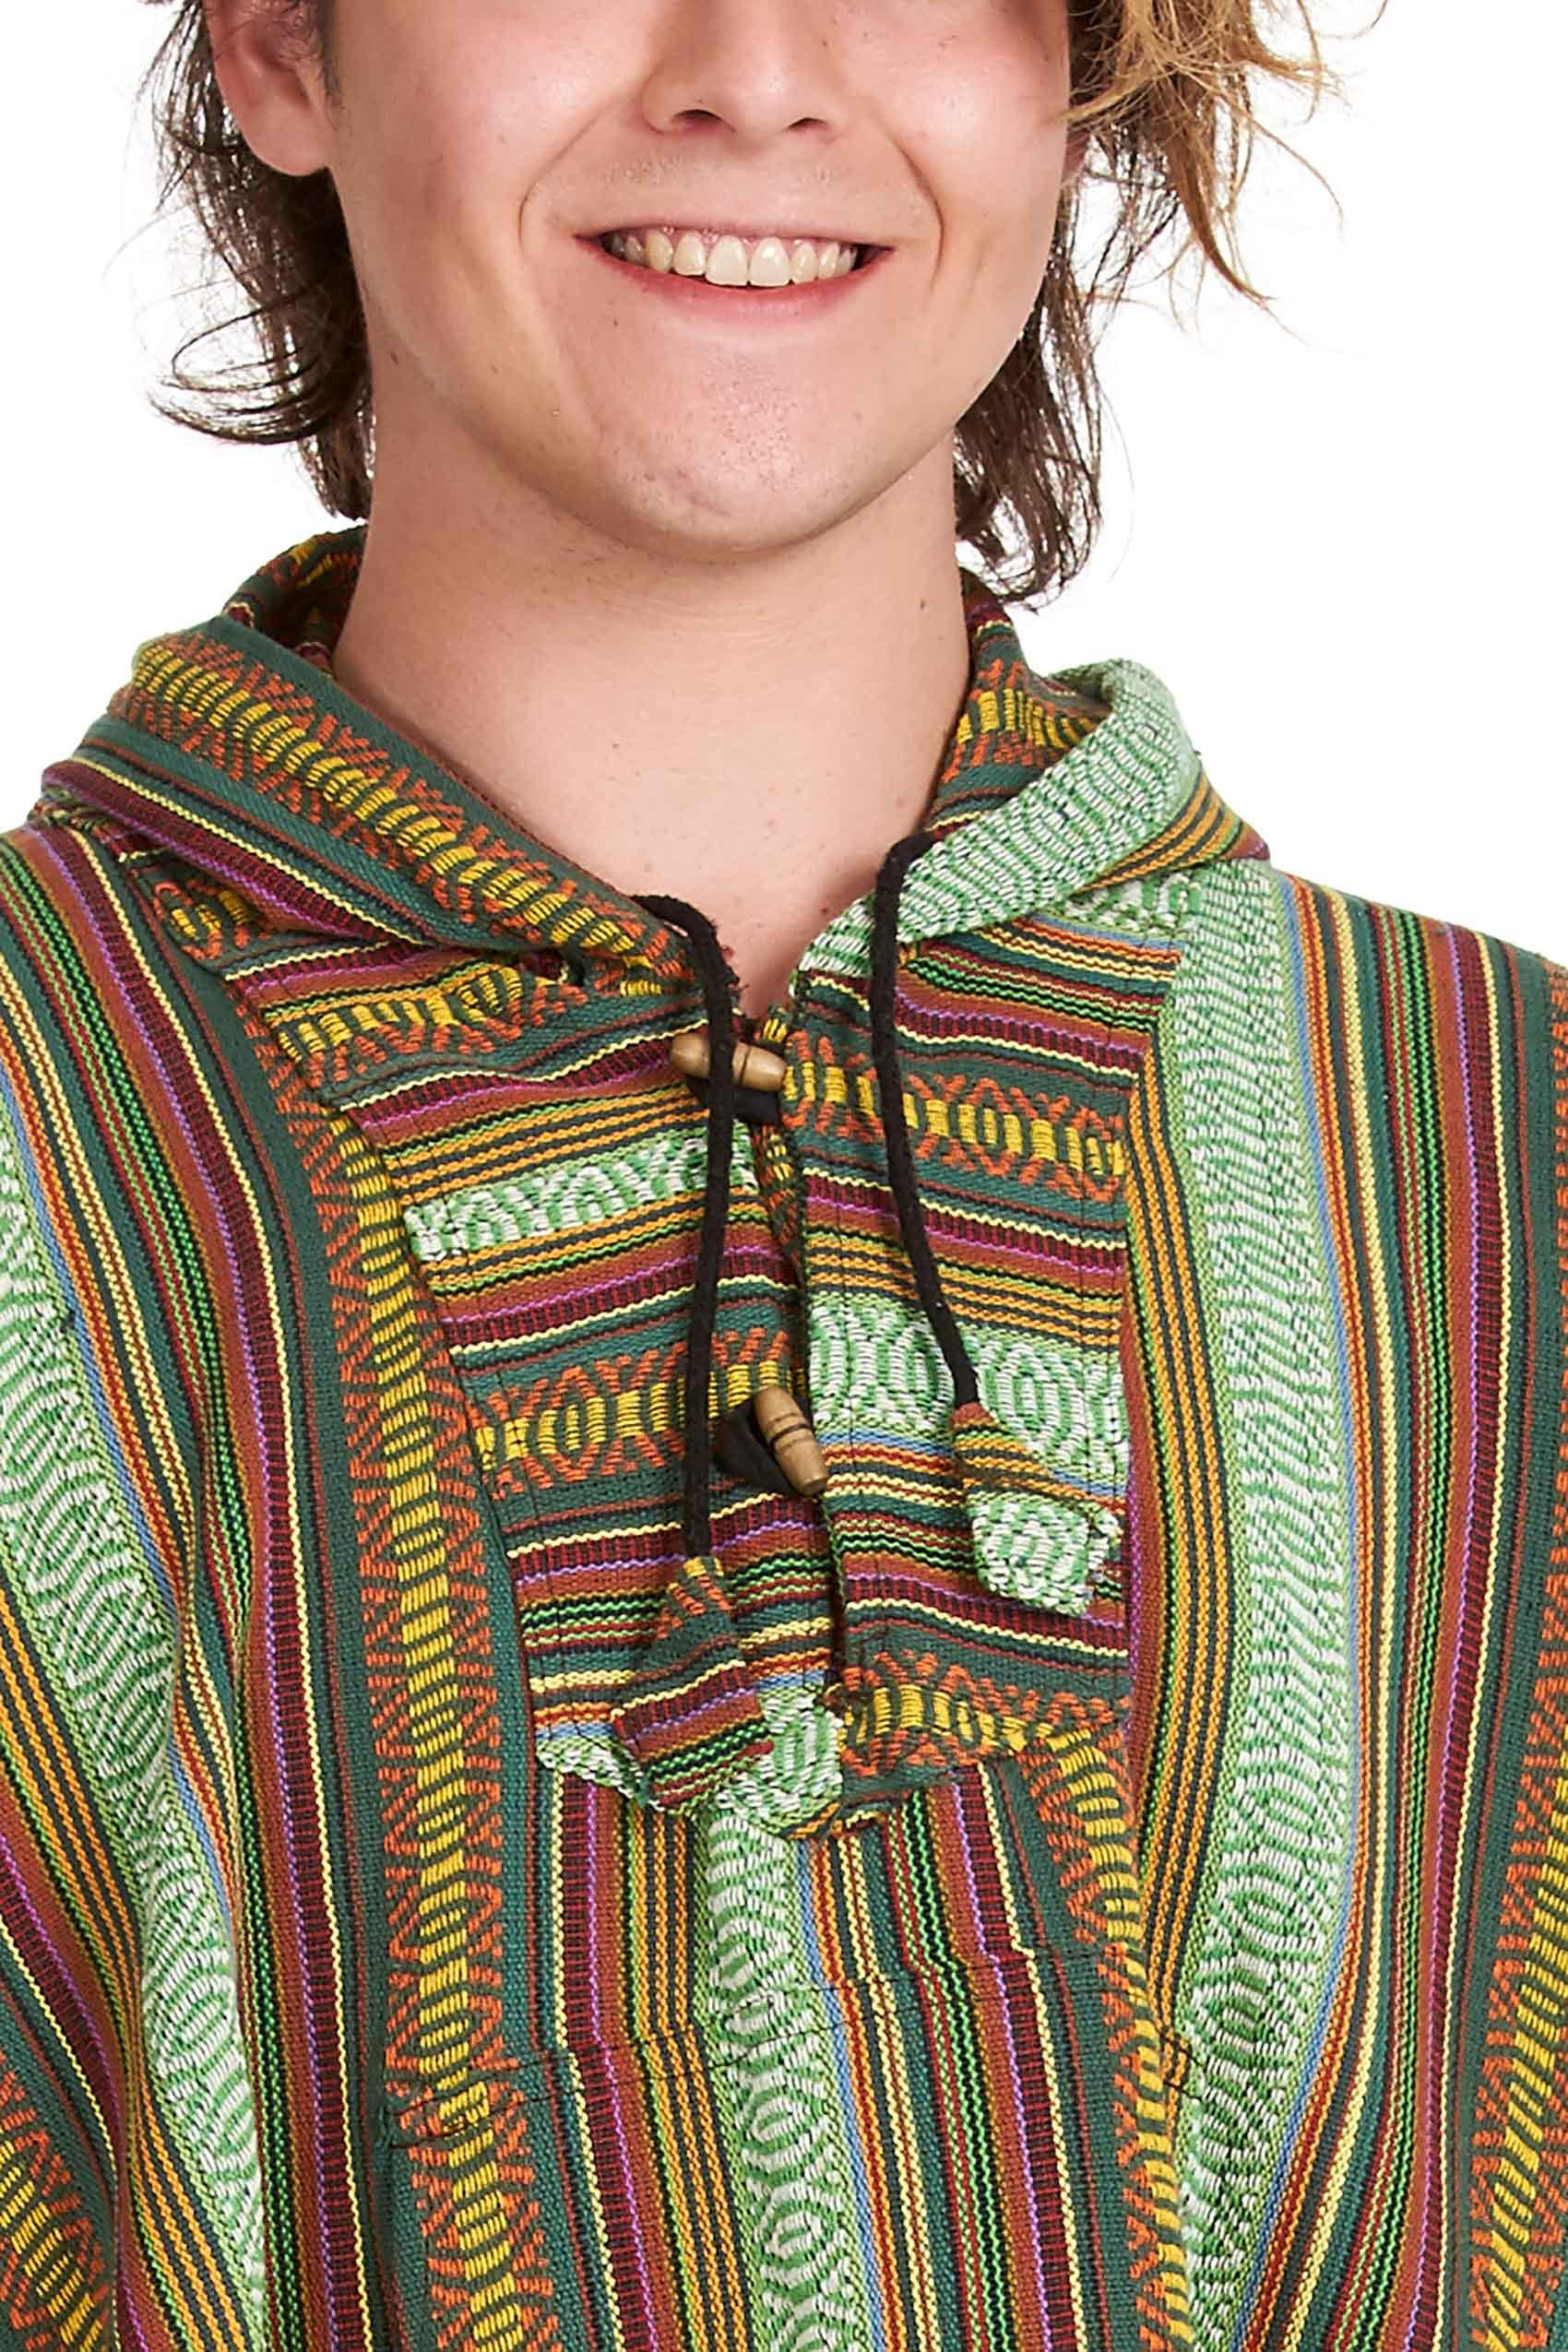 festival hippy poncho hooded plus size festival clothing